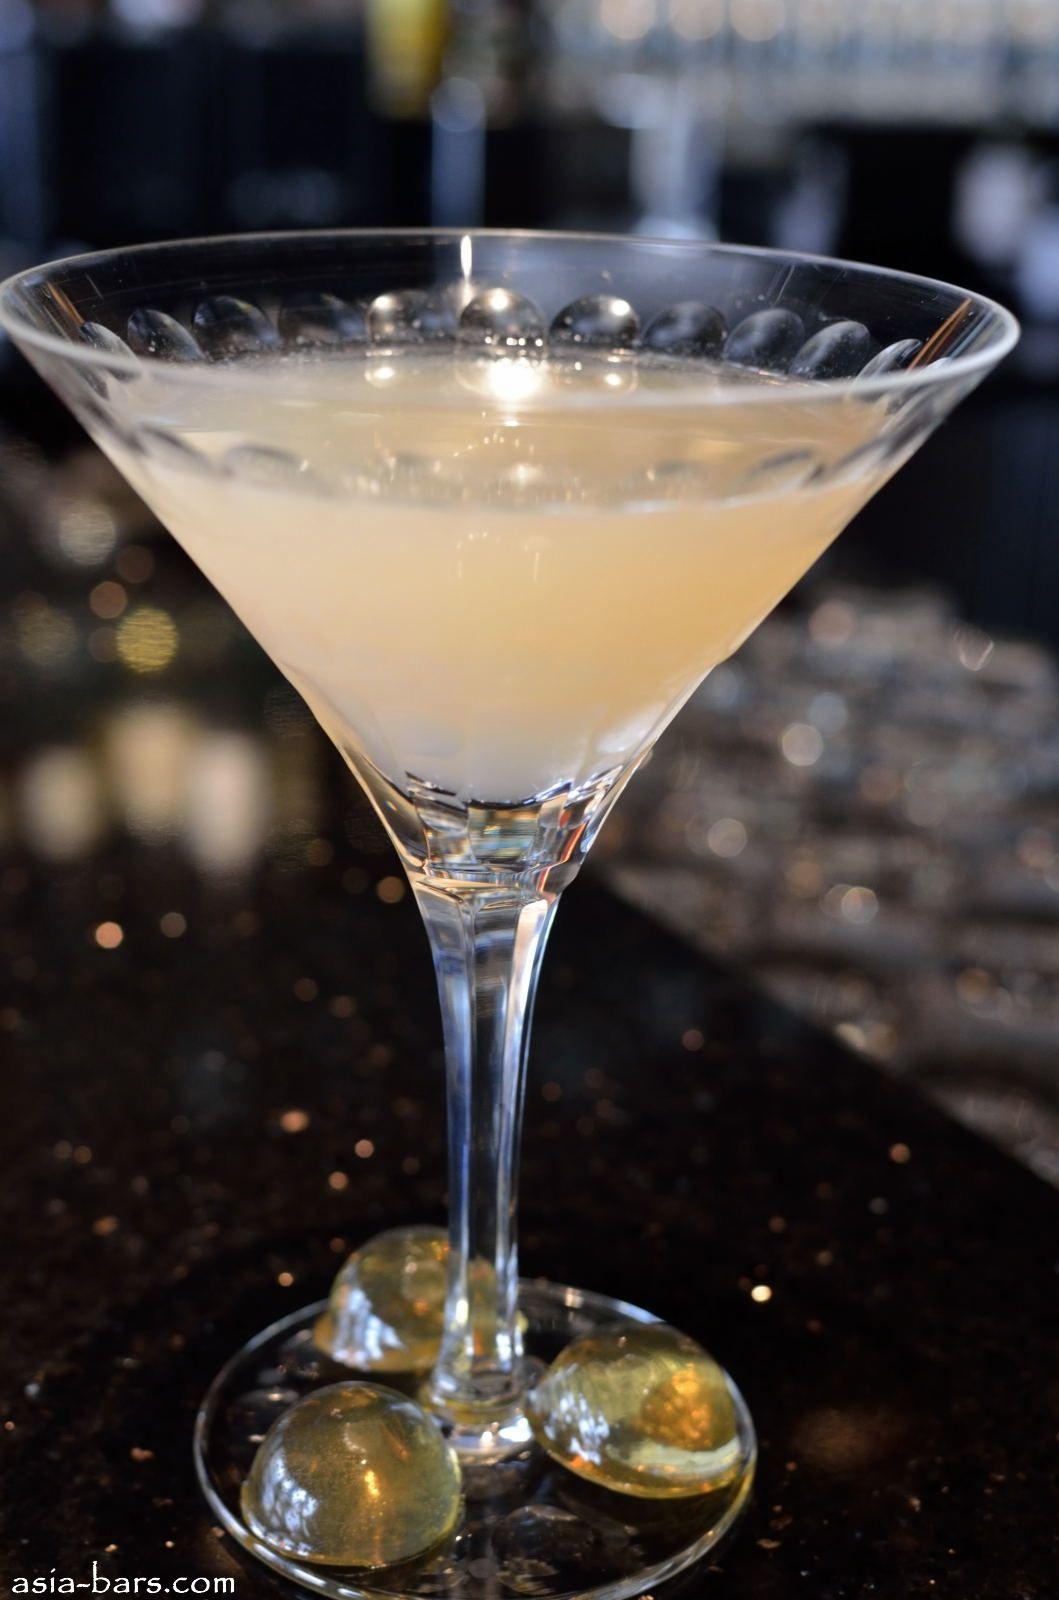 From The Martini Cocktail Menu At M Bar Mandarin Oriental Hong Kong Hong Kong Legend Vodka Kuei Hua Chen Chiew Mandarin Oriental Happy Wine Vodka Lime